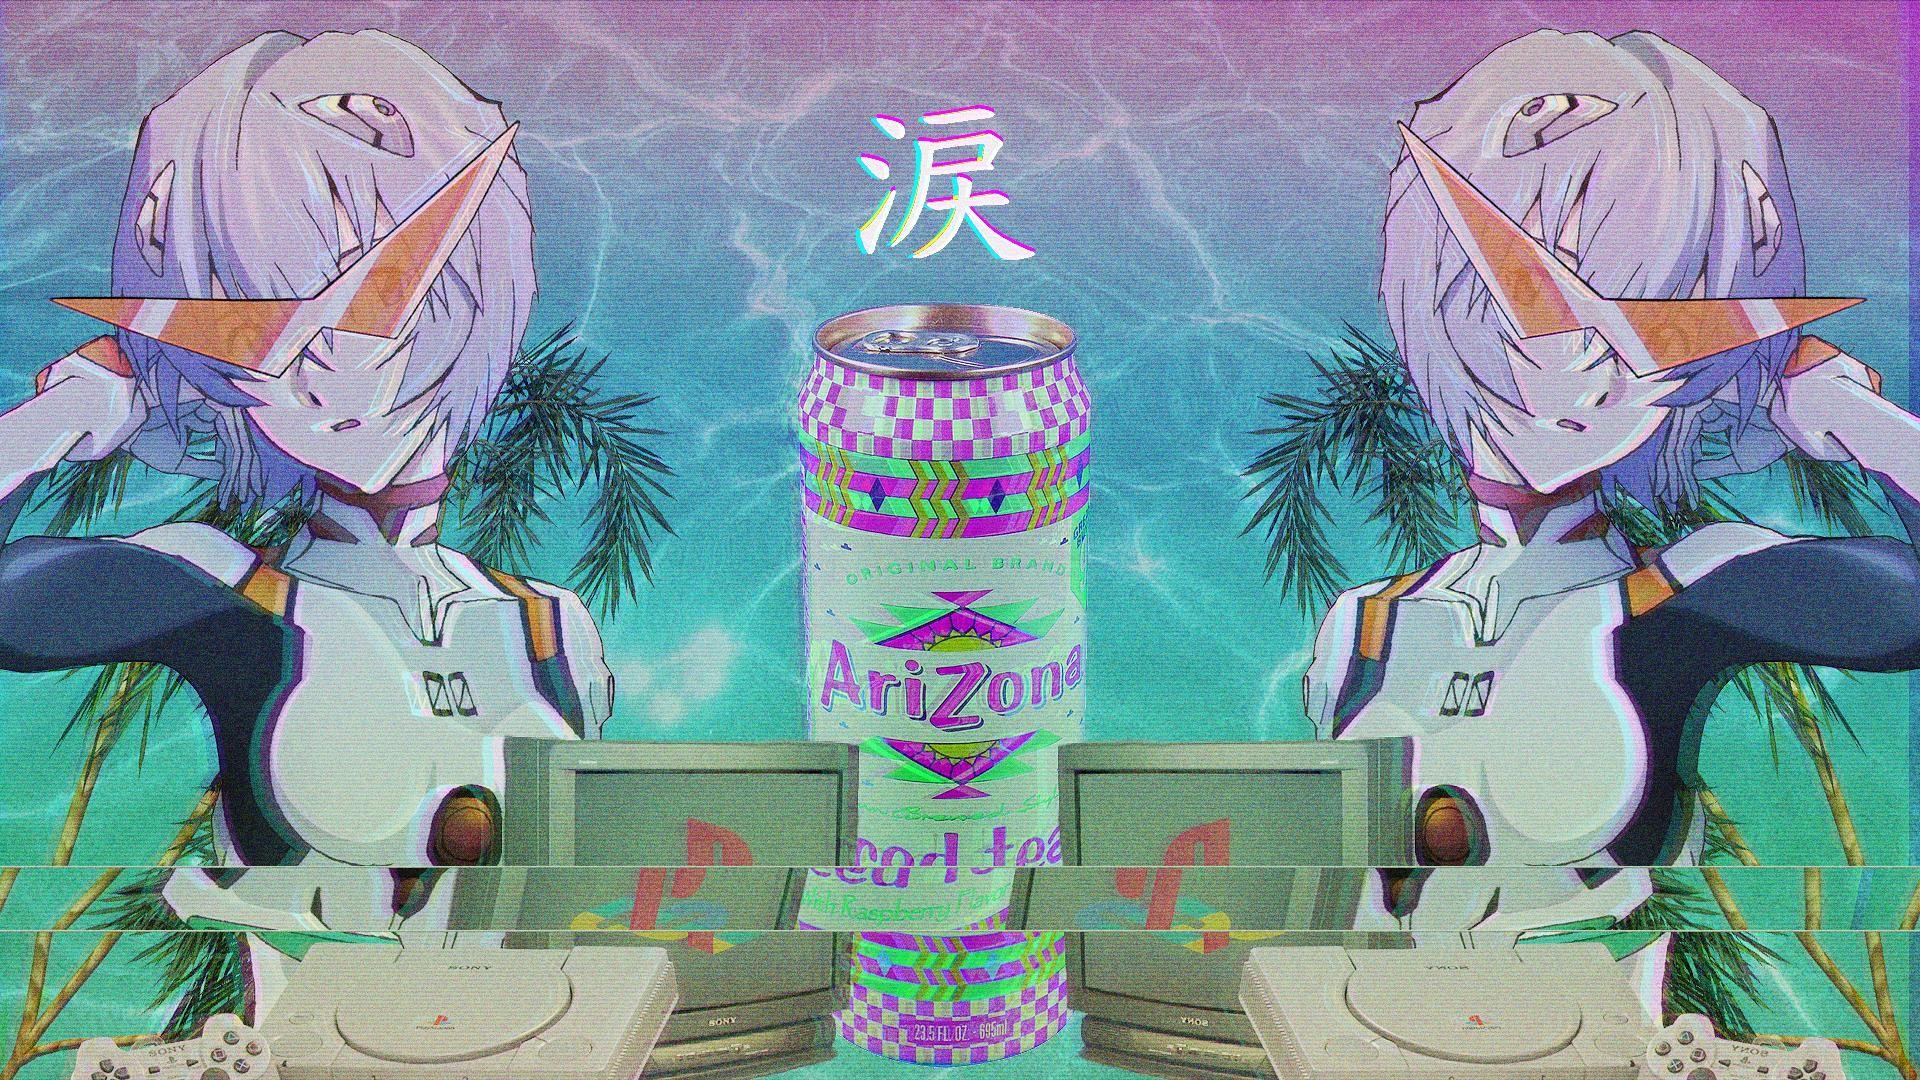 Most Inspiring Wallpaper Anime Aesthetic - 7377658efd0a53a4706ff87c598bcaf4  Photograph_22537      .jpg